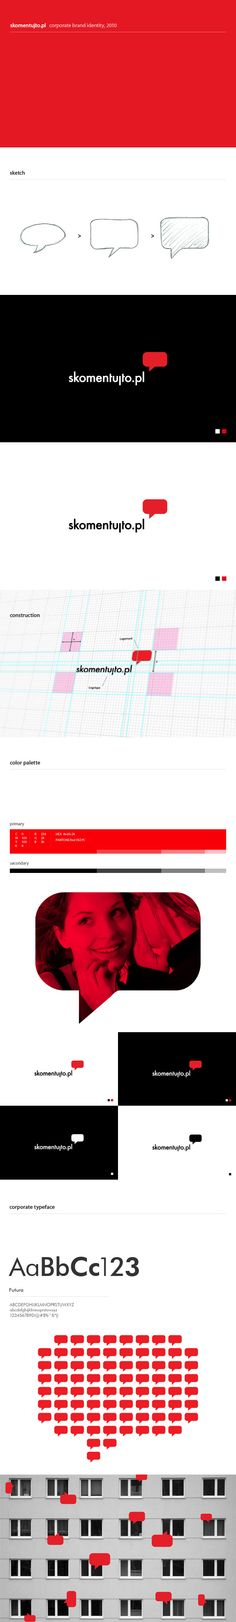 Logotype and mark design construction for Skomentujto.pl